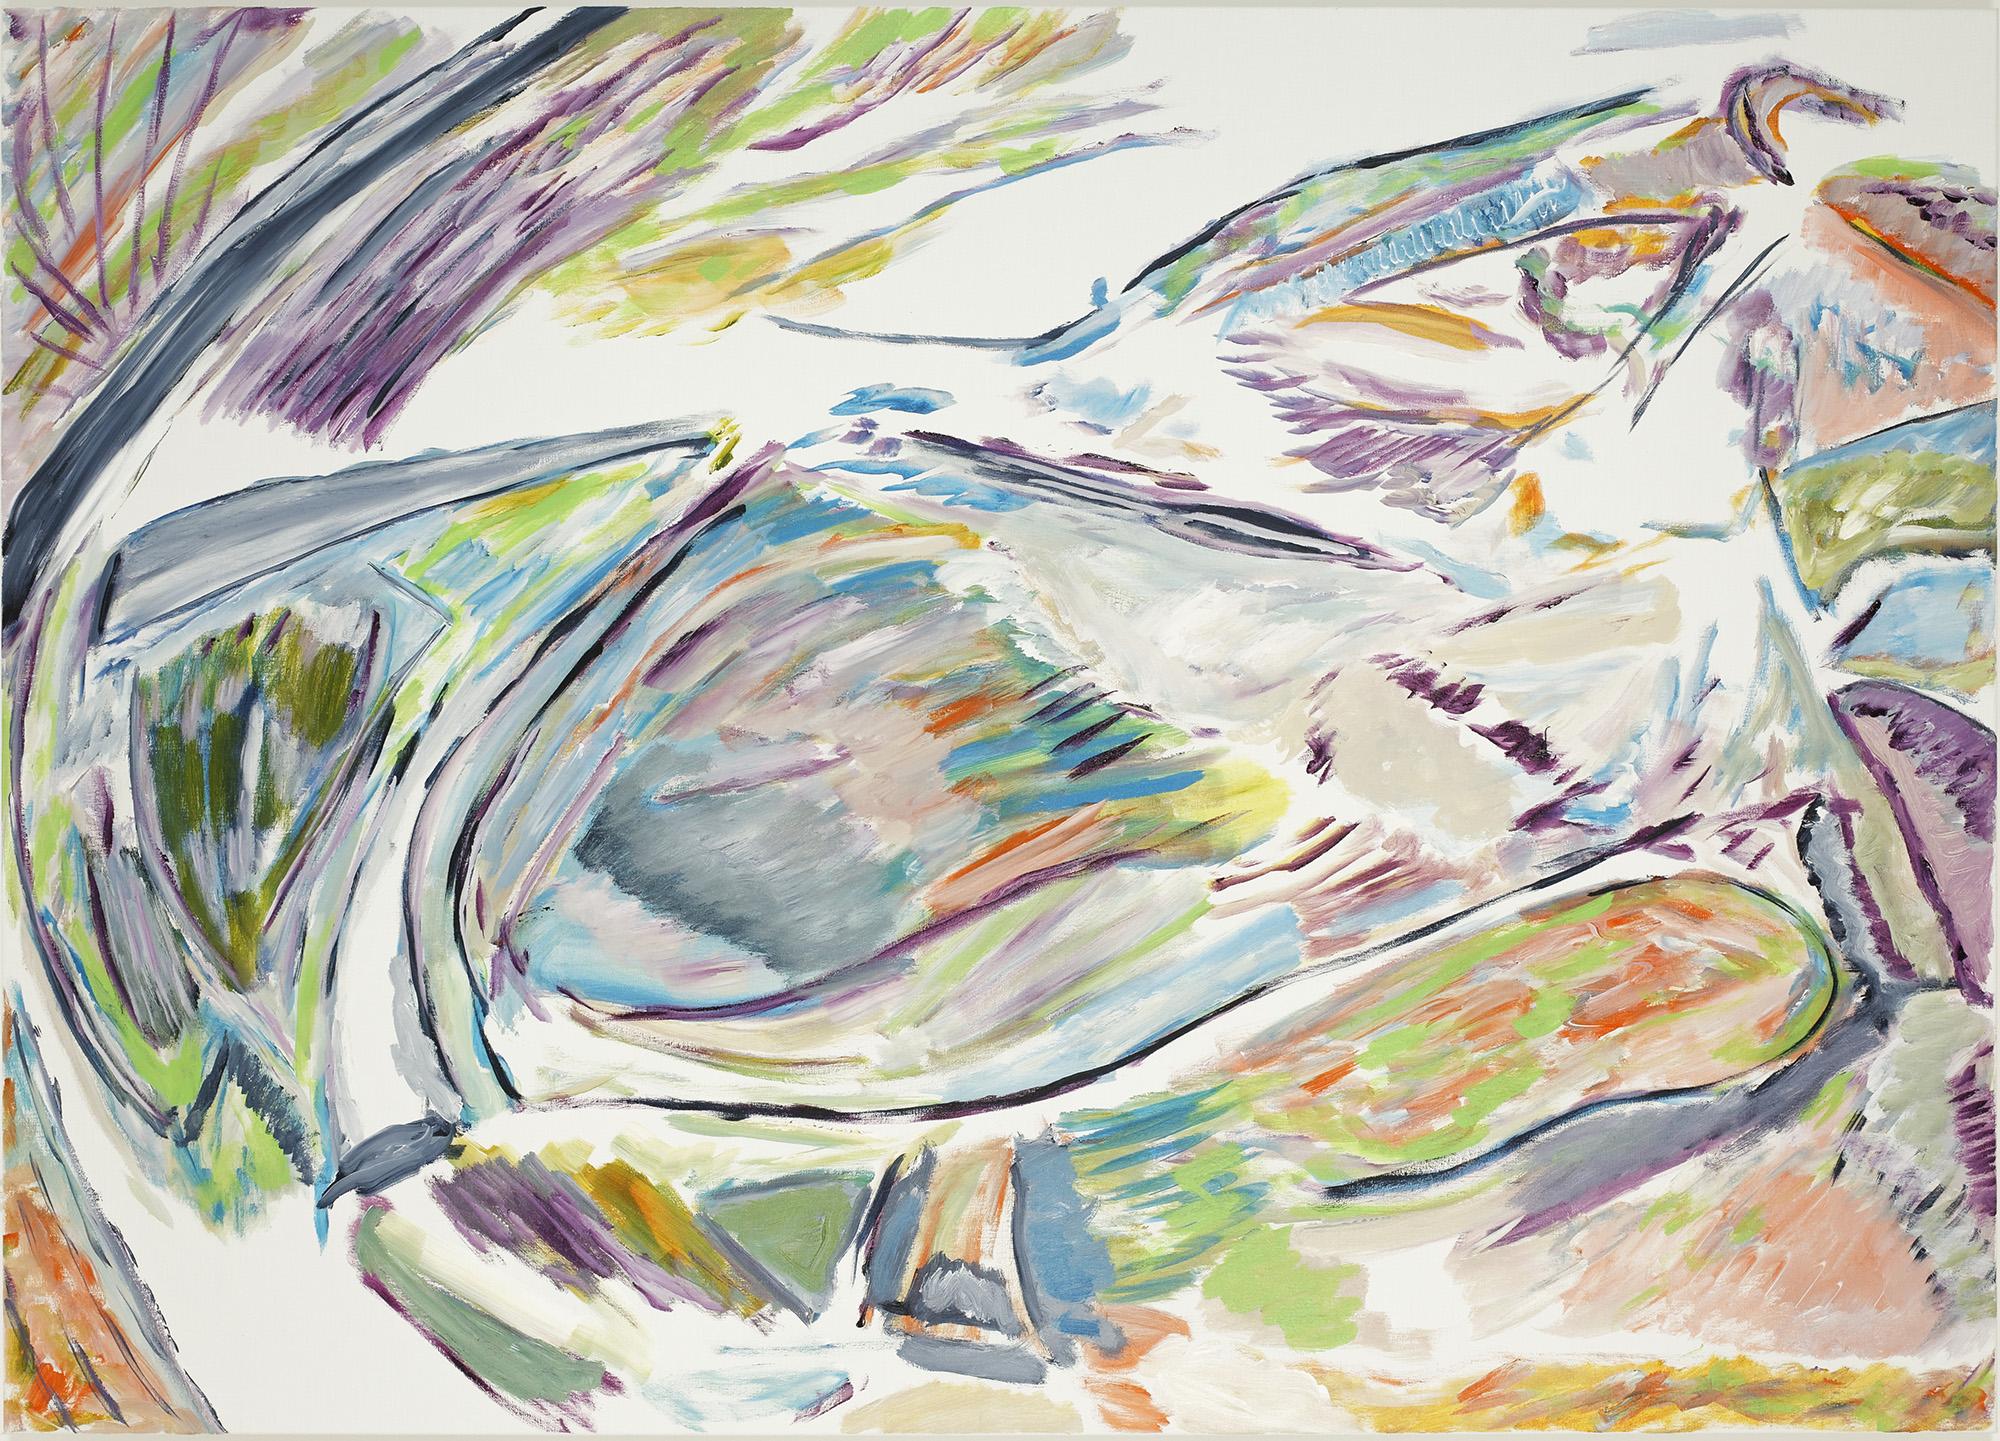 Tournis (acrylic on canvas, 100 x 140 cm - 2018)